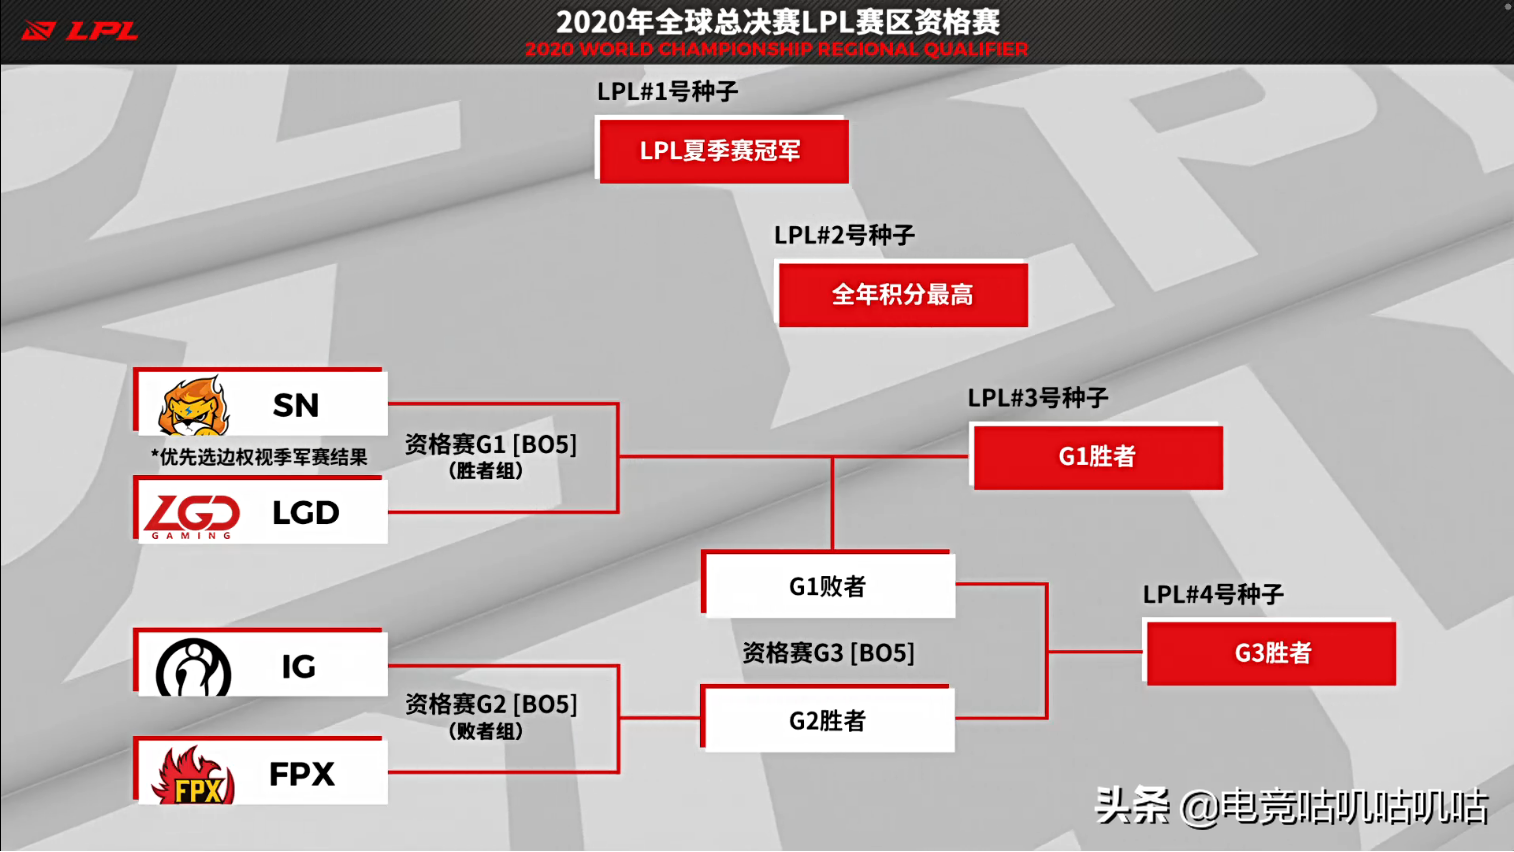 JDG战胜LGD和TES再次会师,成为第6支锁定S10的队伍